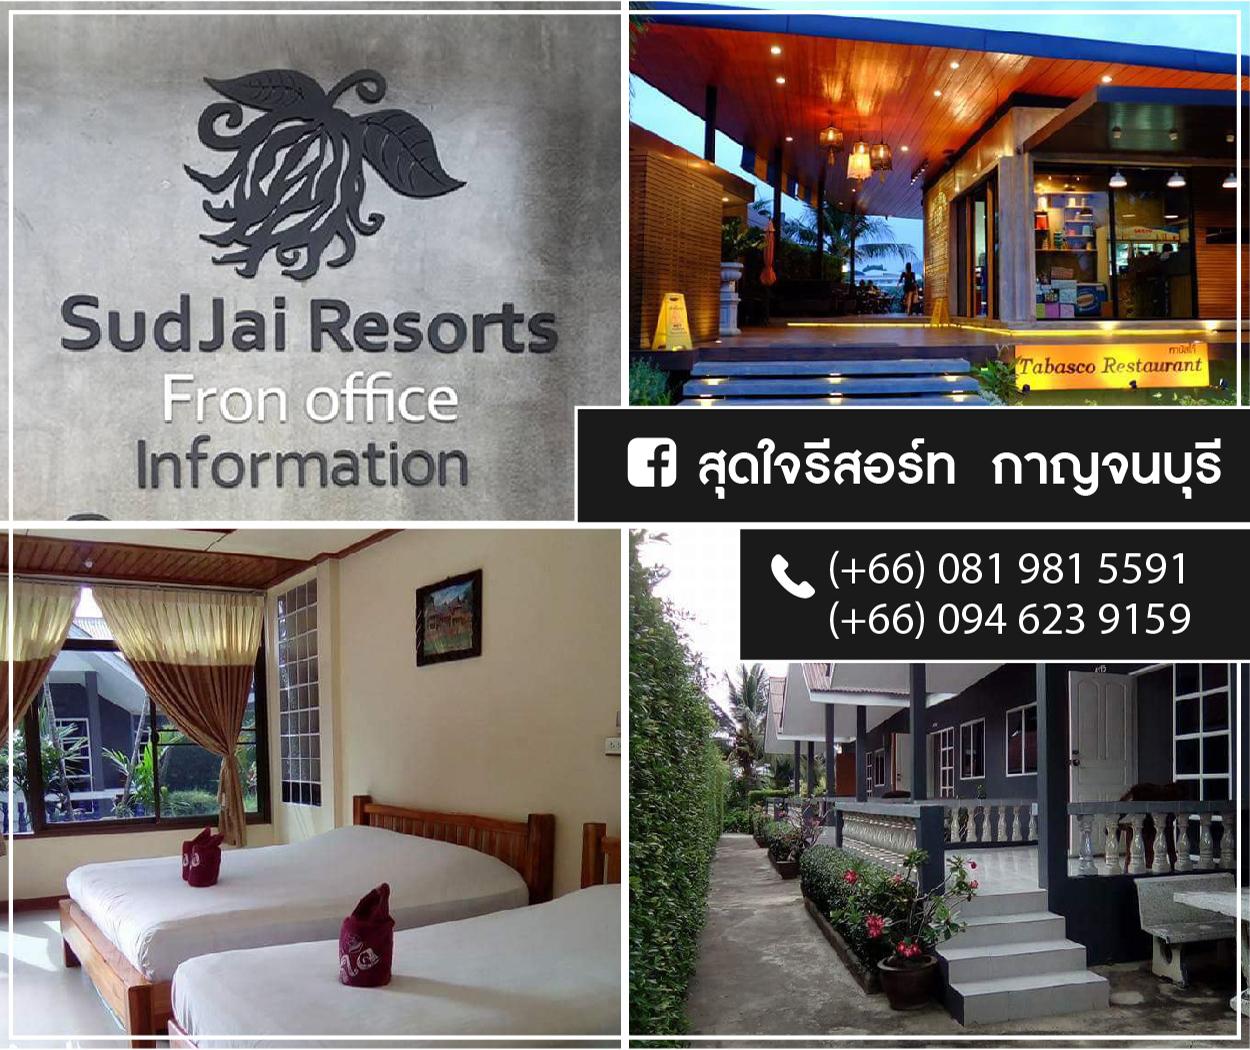 SudJai Resorts